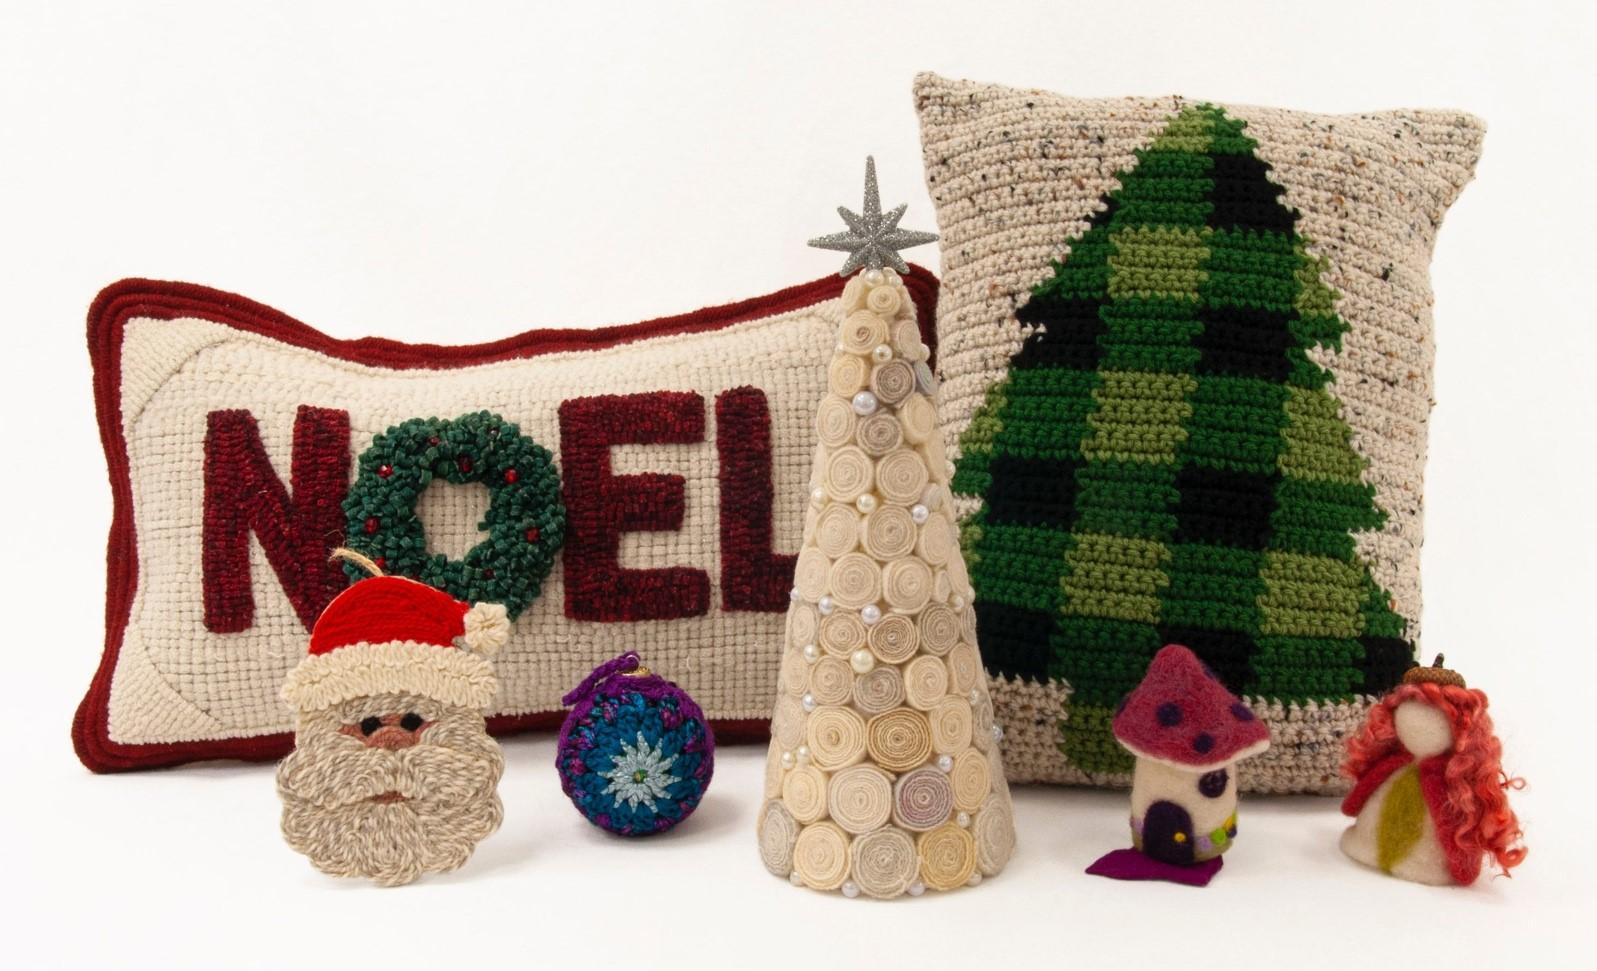 Classes, Kits & Textile Art (Fashion Arts & Creative Textile Studio) Image